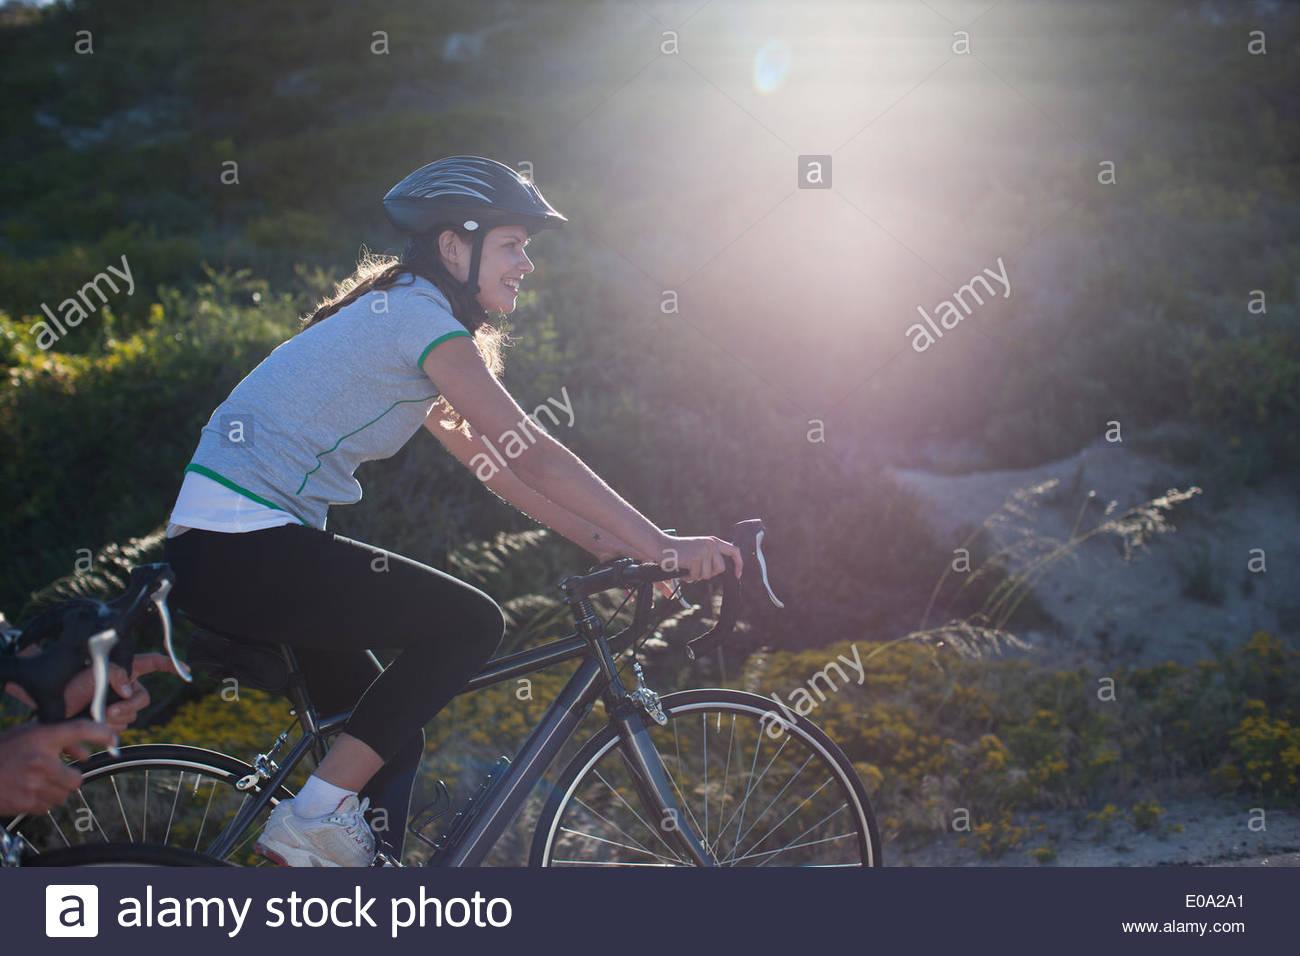 Frau-Radfahren in abgelegenen Gegend Stockbild